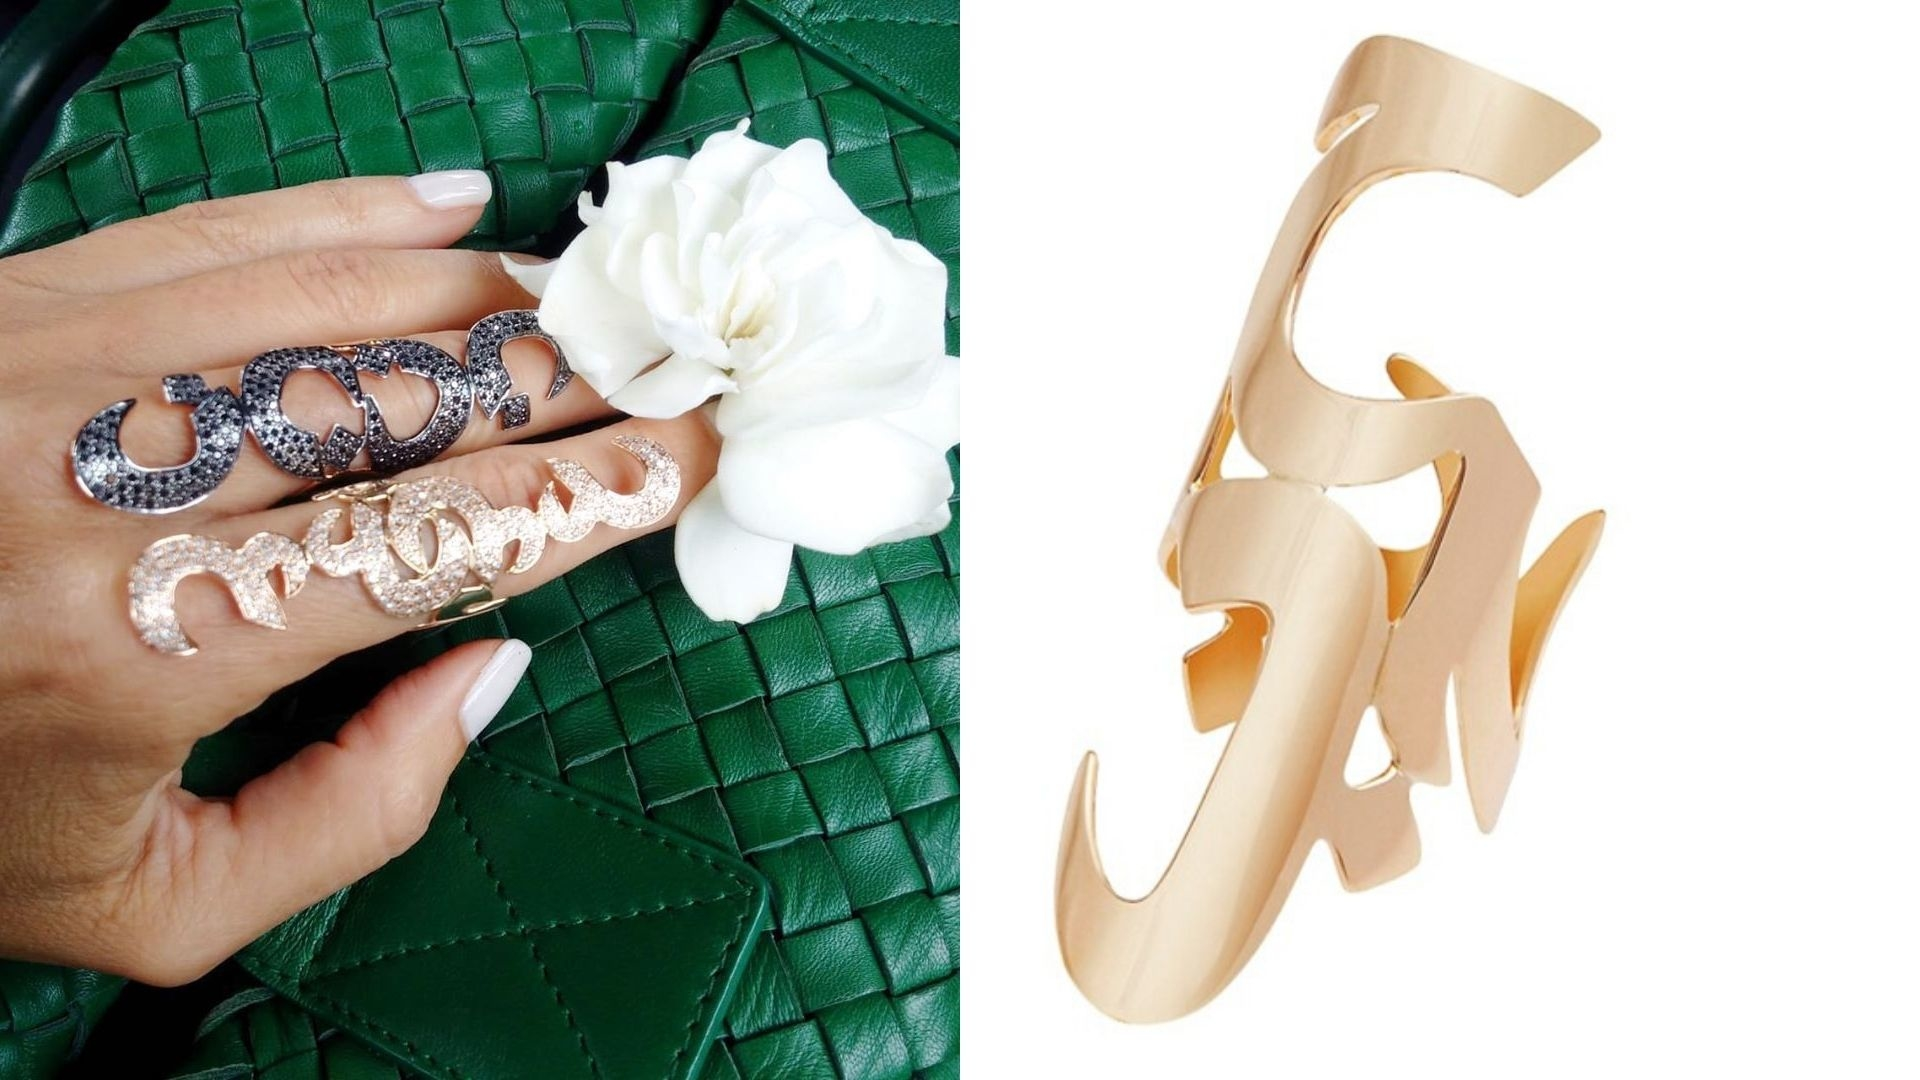 Bil Arabi Donates Its Signature 'Love' Ring To Abu Dhabi Dream Ball's Silent Auction